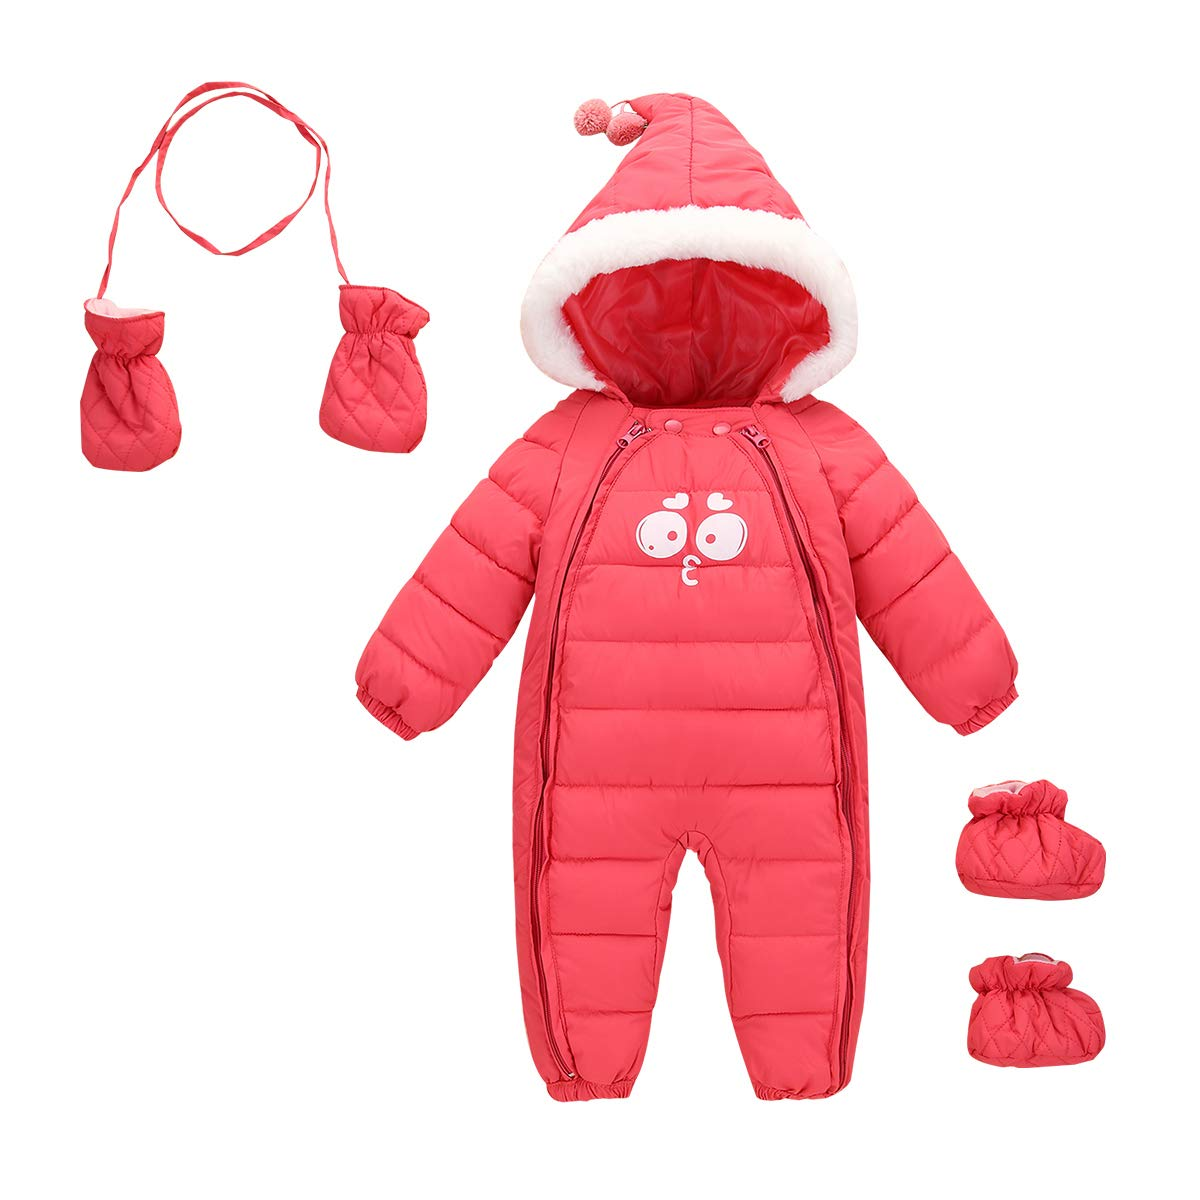 Aivtalk Baby Winter Bodysuit Snowsuit Girls Toddler Warm Zipped Hooded Puffer One Piece With Glove and Socks 24-30 Months Pink by Aivtalk